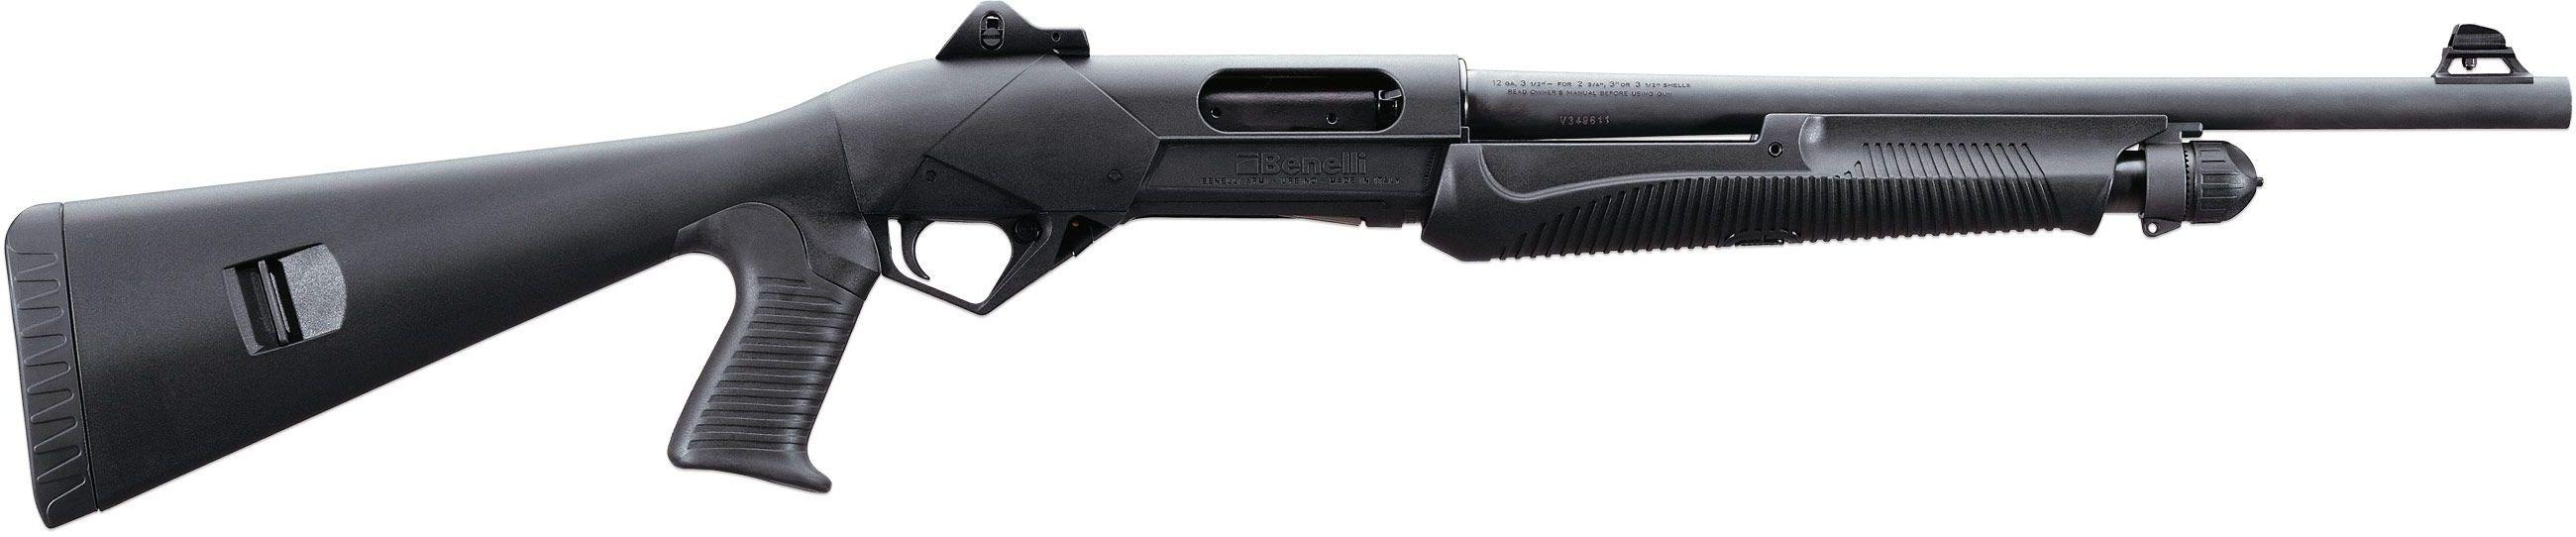 benelli supernova tactical 12 ga firearms pinterest